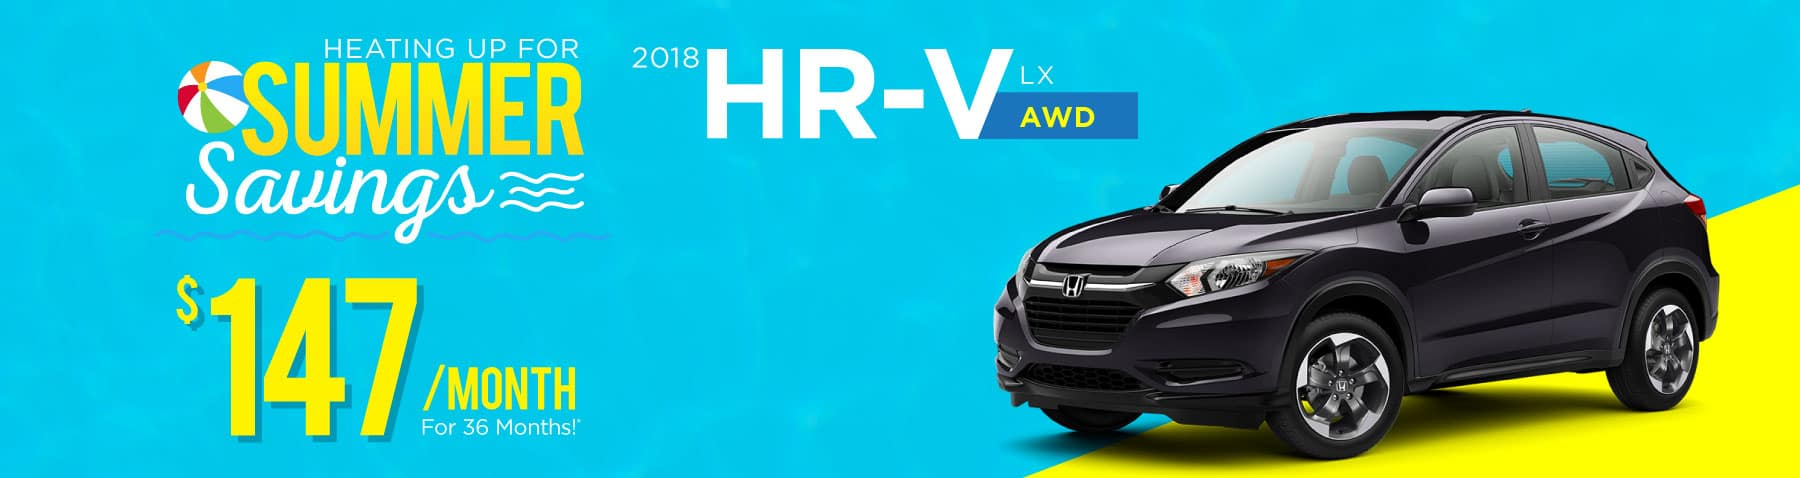 Header Photo of the new 2018 Honda HR-V